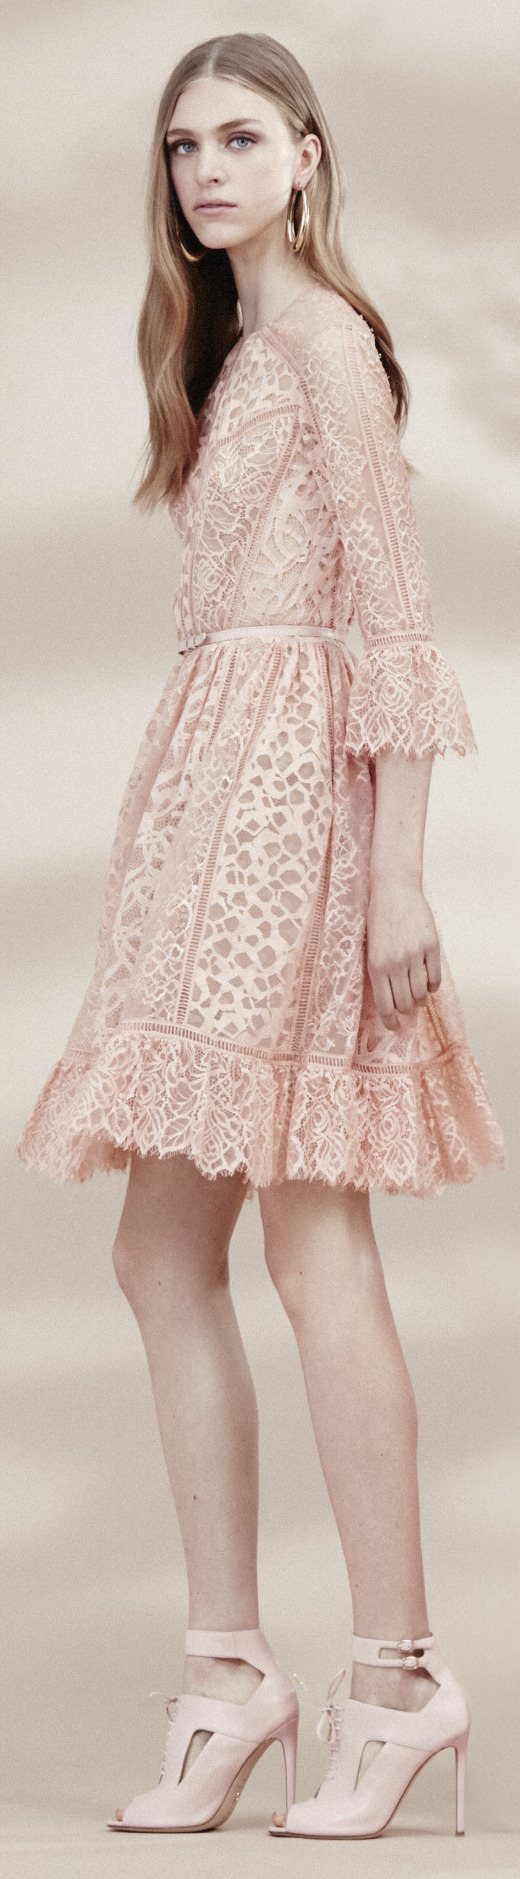 Nude and Blush Sexy Dresses | Pinterest | Vestiditos, Vestidos ...